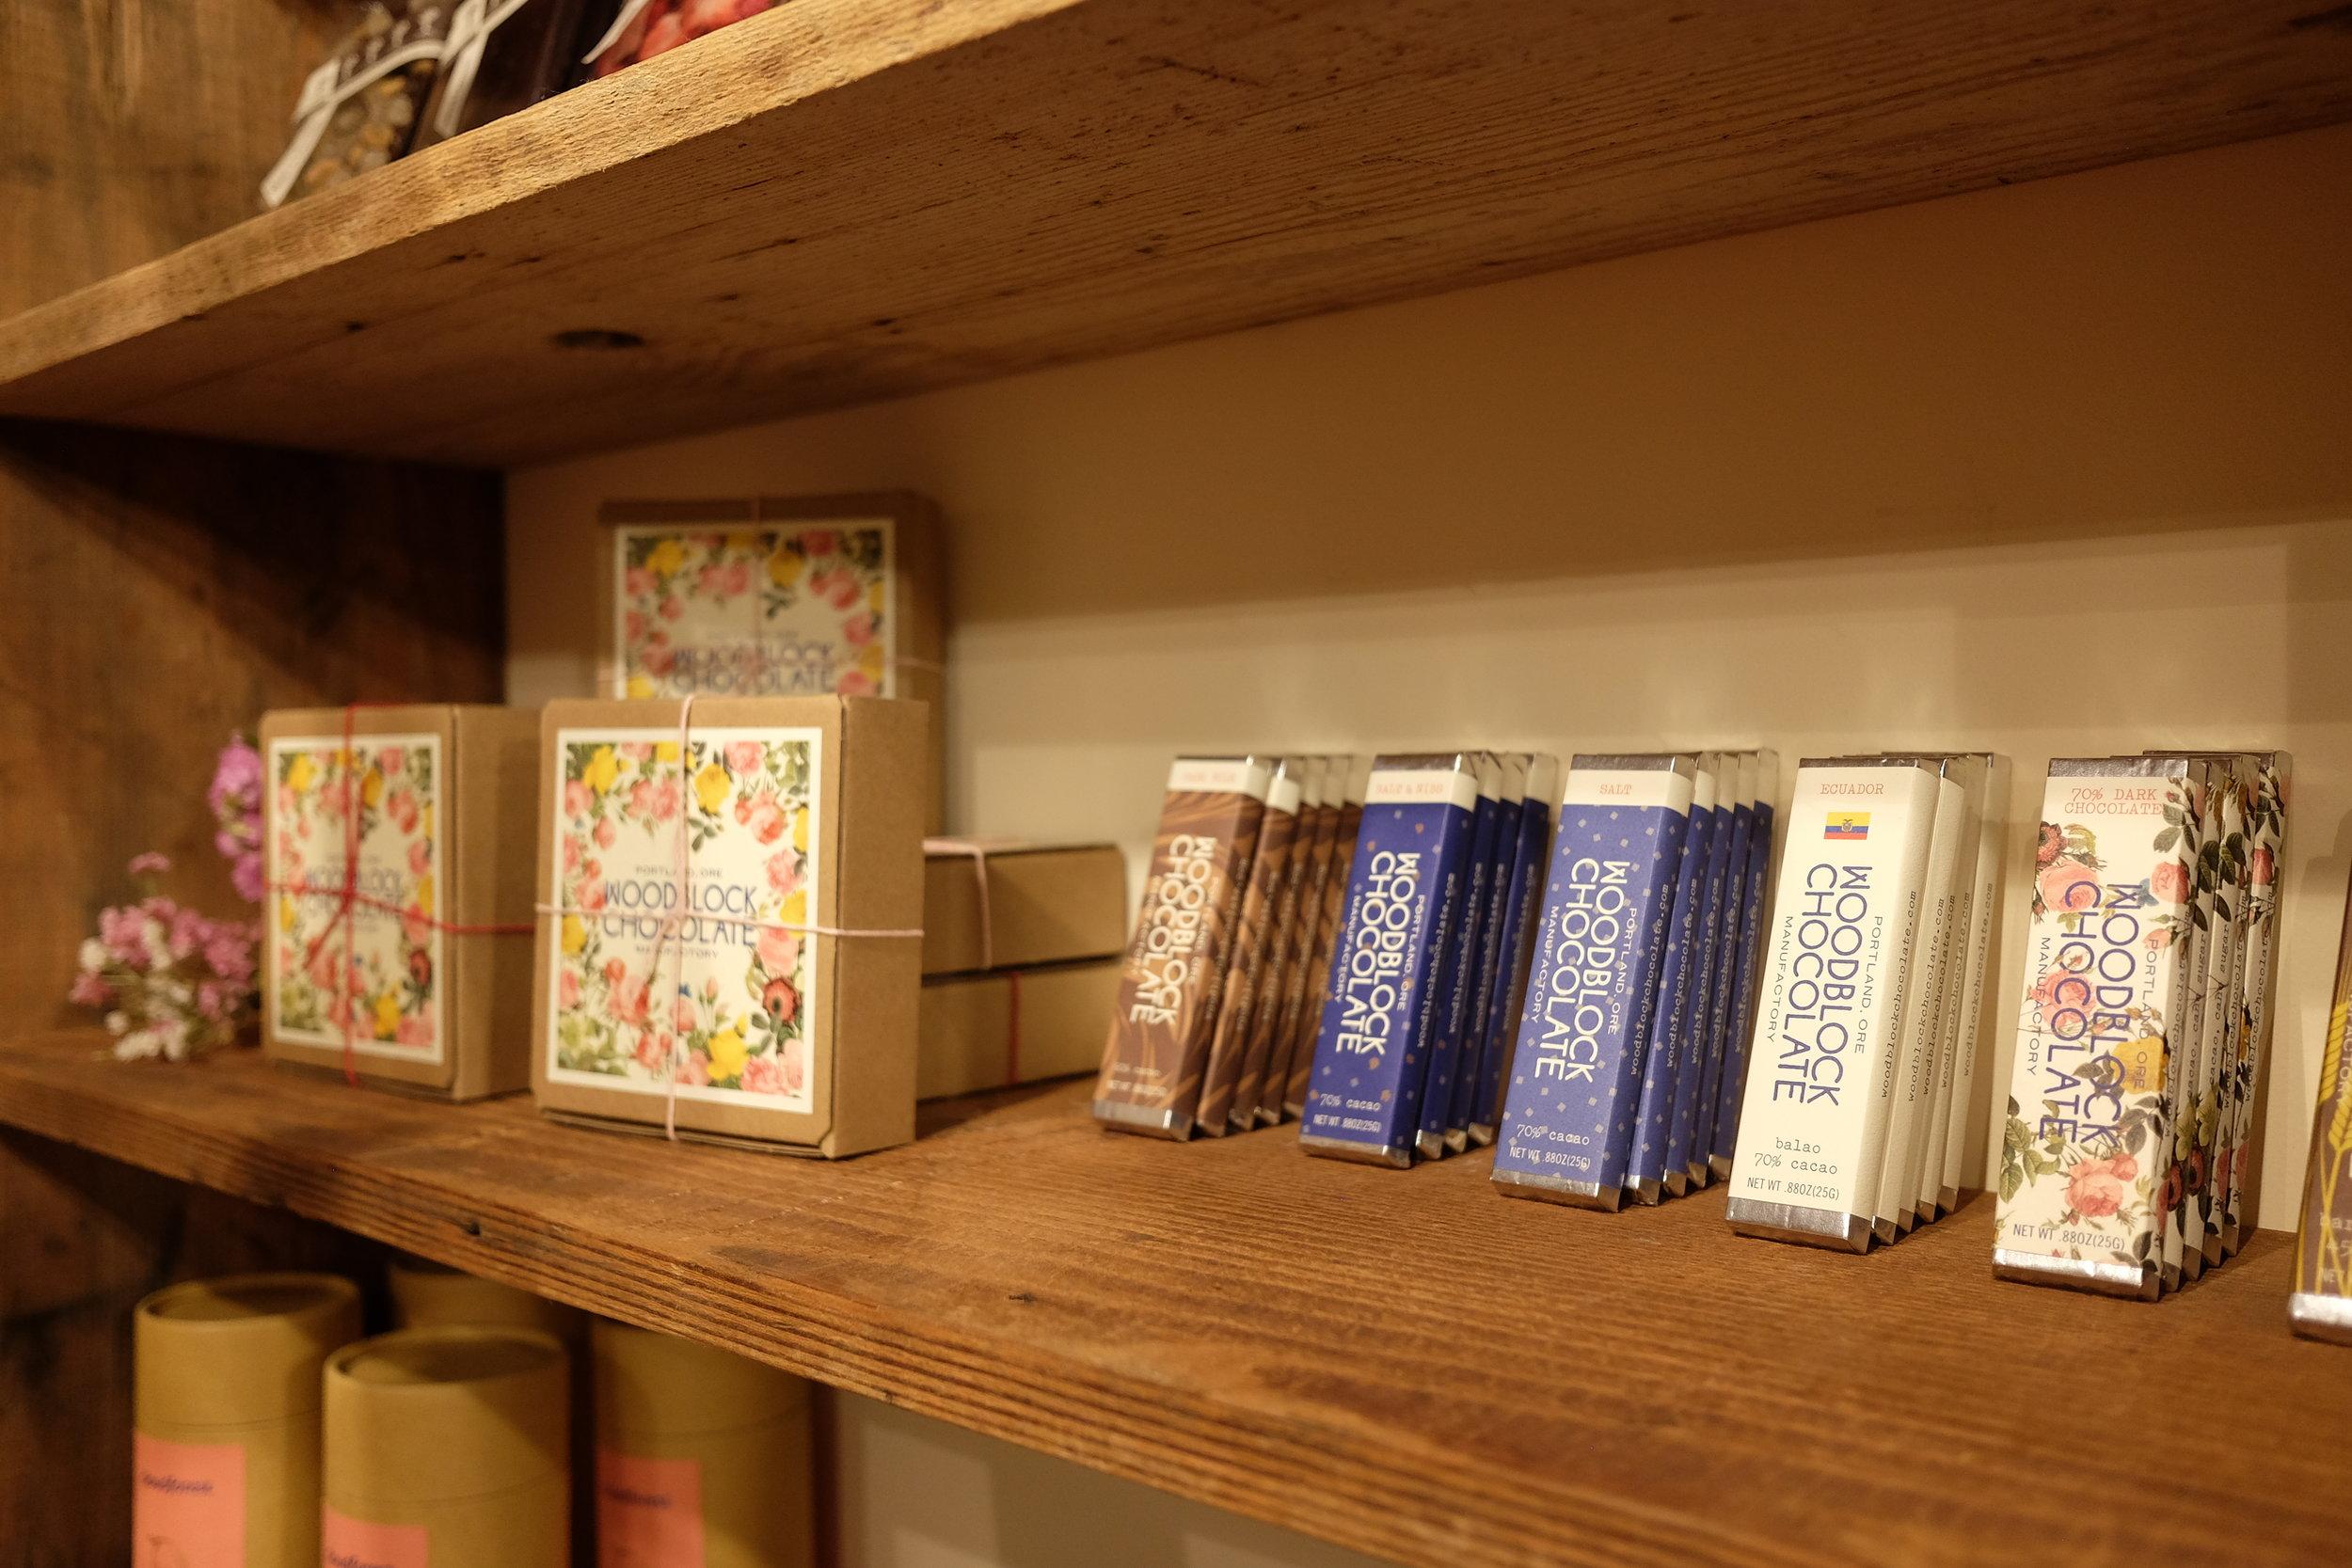 The Meadow_ルミネ新宿_WOODBLOCK CHOCOLATE